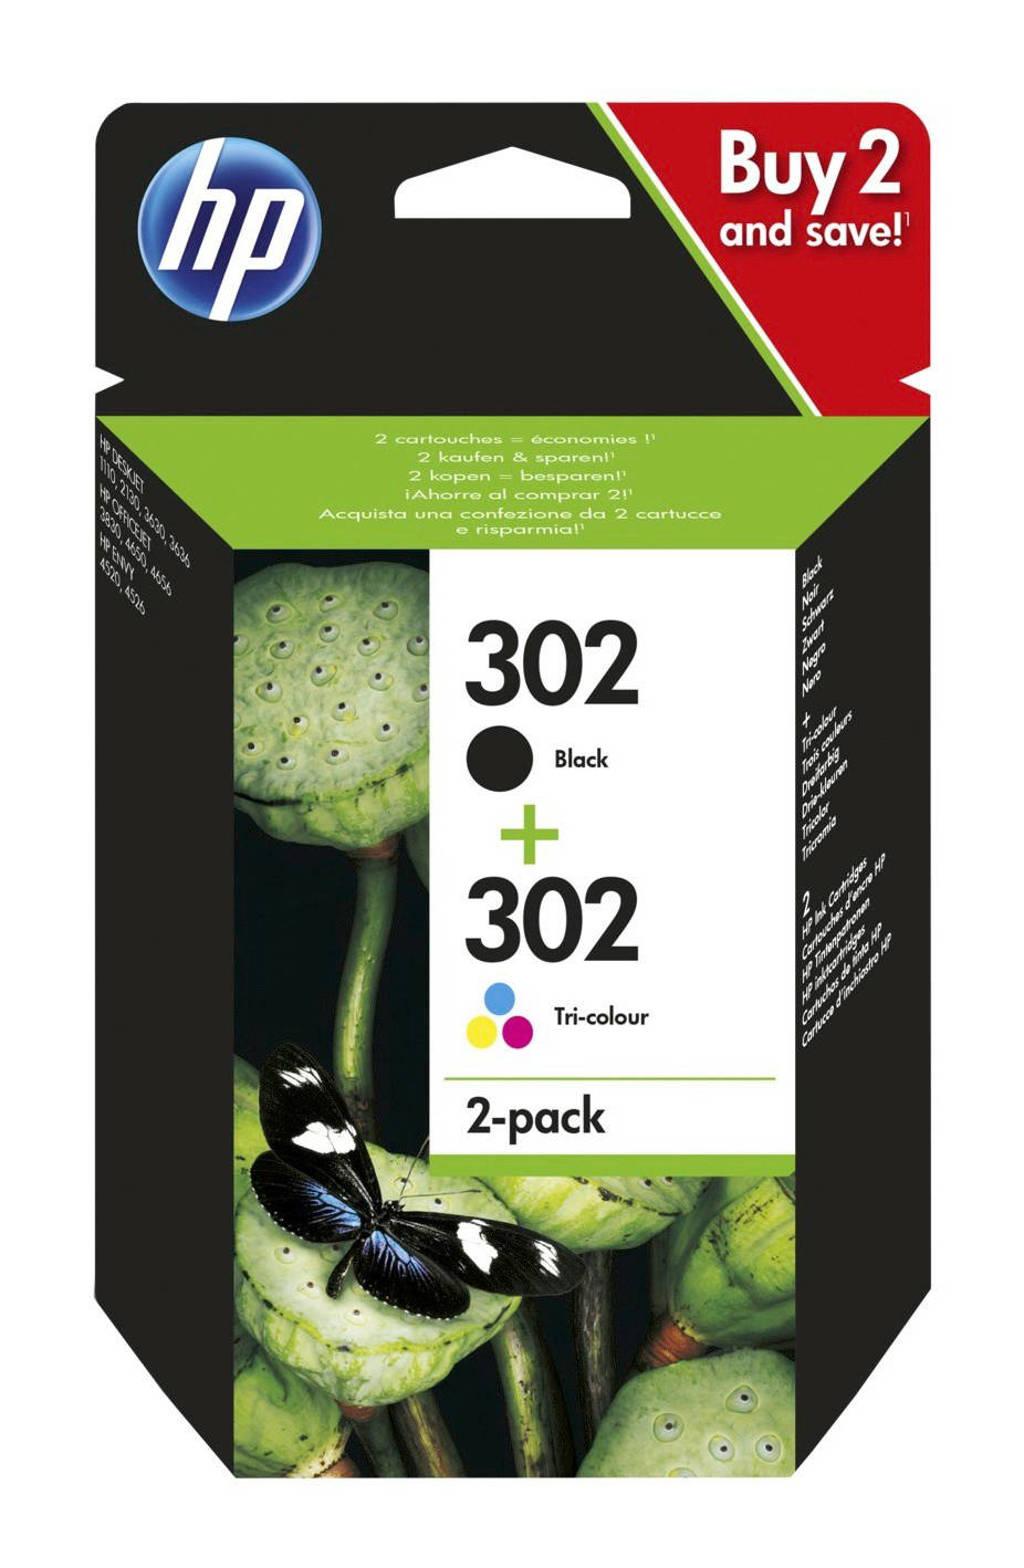 HP HP 302 INK 2-PAC inkt cartridge 302 2-pack (zwart + kleur), Zwart, Geel, Cyaan en Magenta